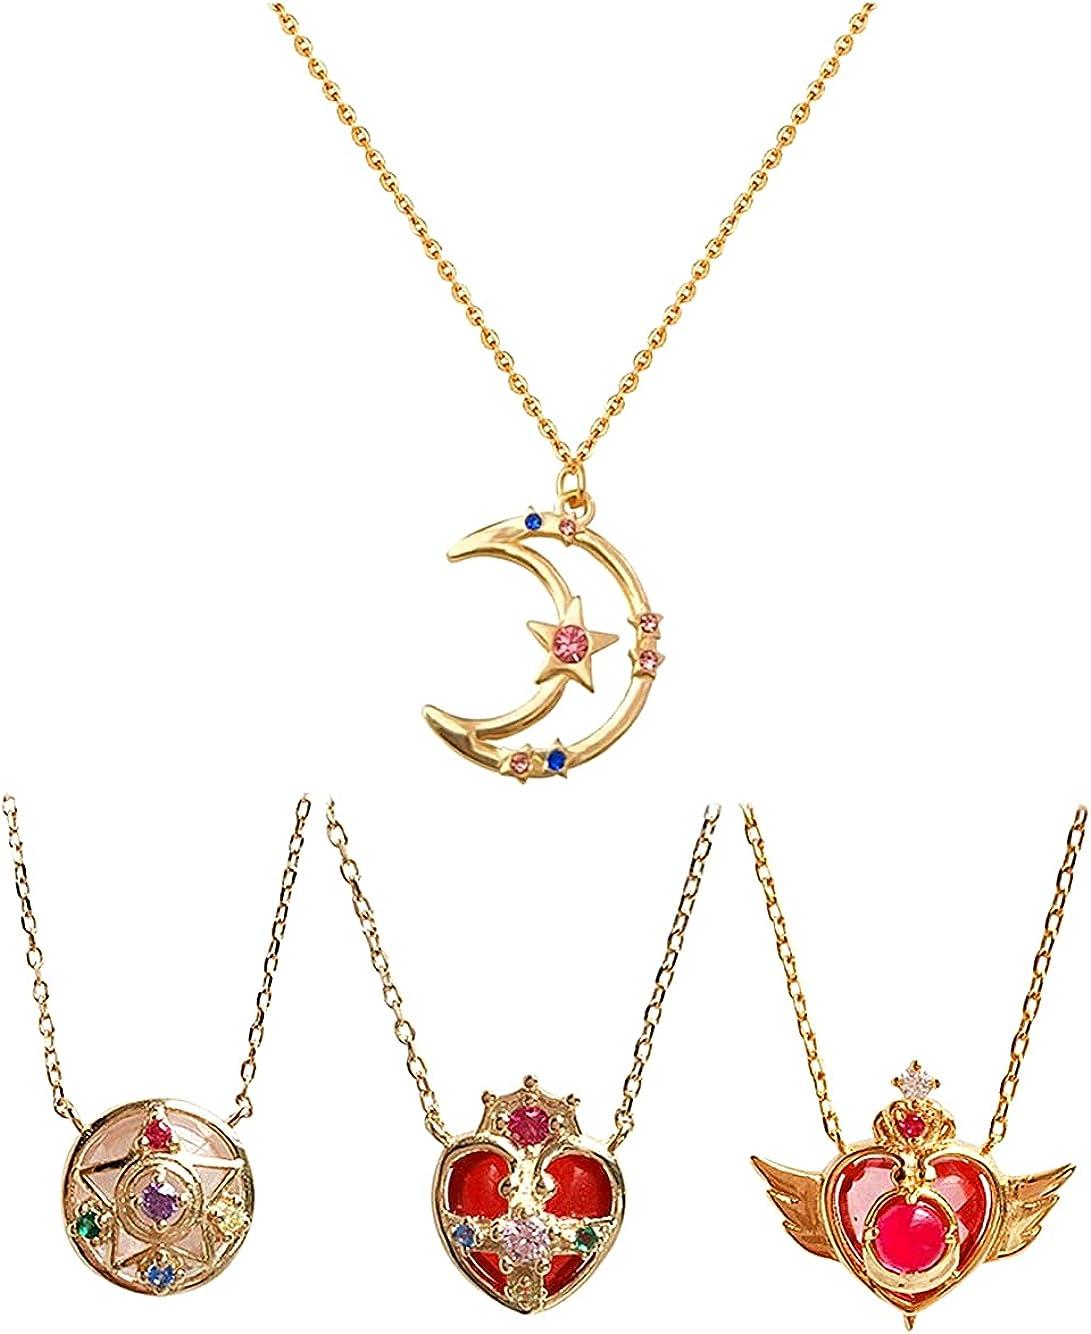 JSSPKJHPO 4 Pcs Anime Cartoon Sailor Moon Guardian Star Clavicle Necklace...